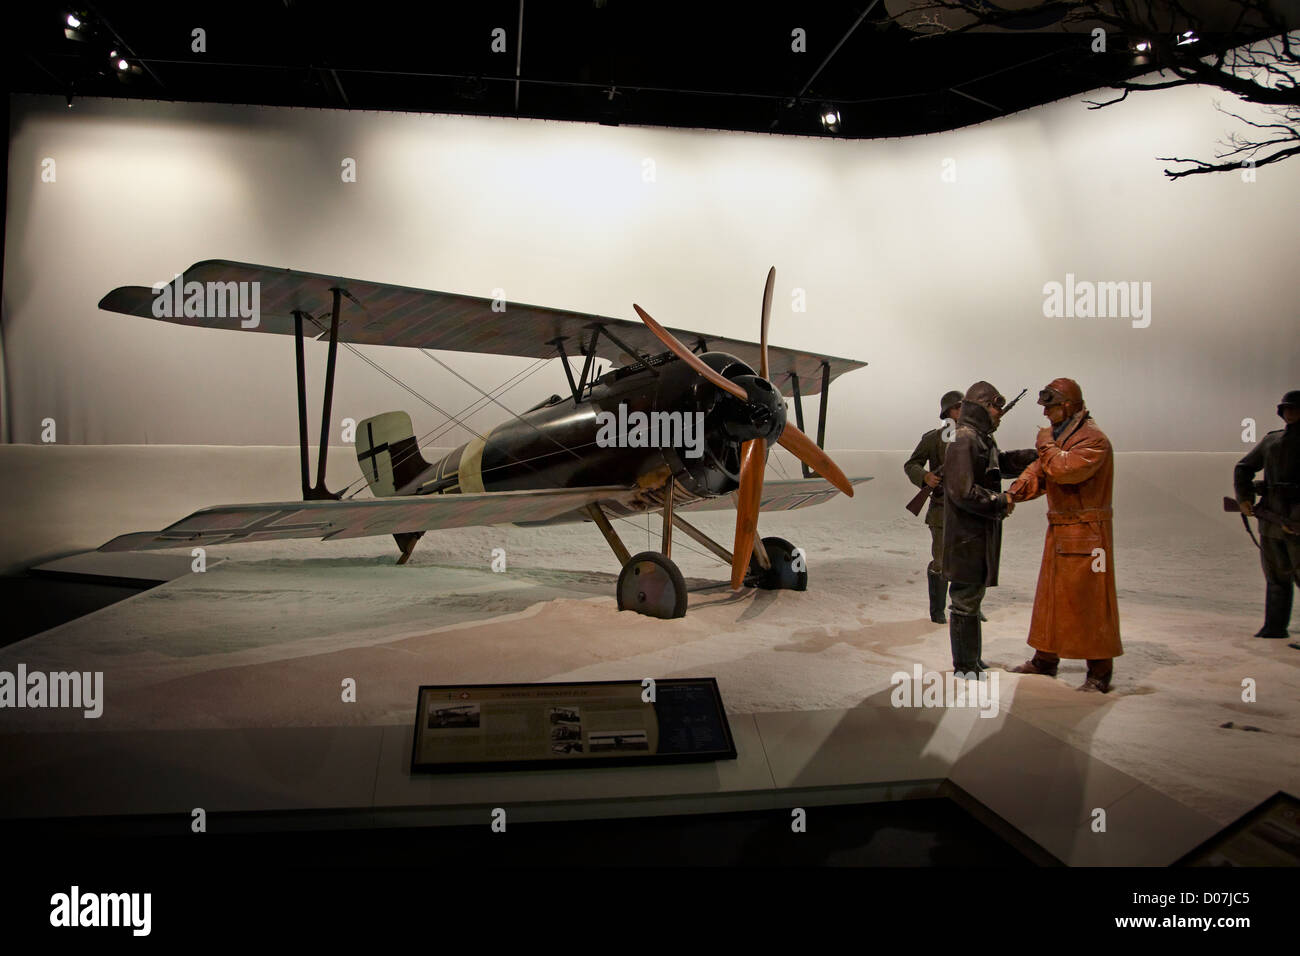 German Siemens Schukert D.IV biplane, Omaka Aviation Heritage Centre, Blenheim, Marlborough, South Island, New Zealand - Stock Image